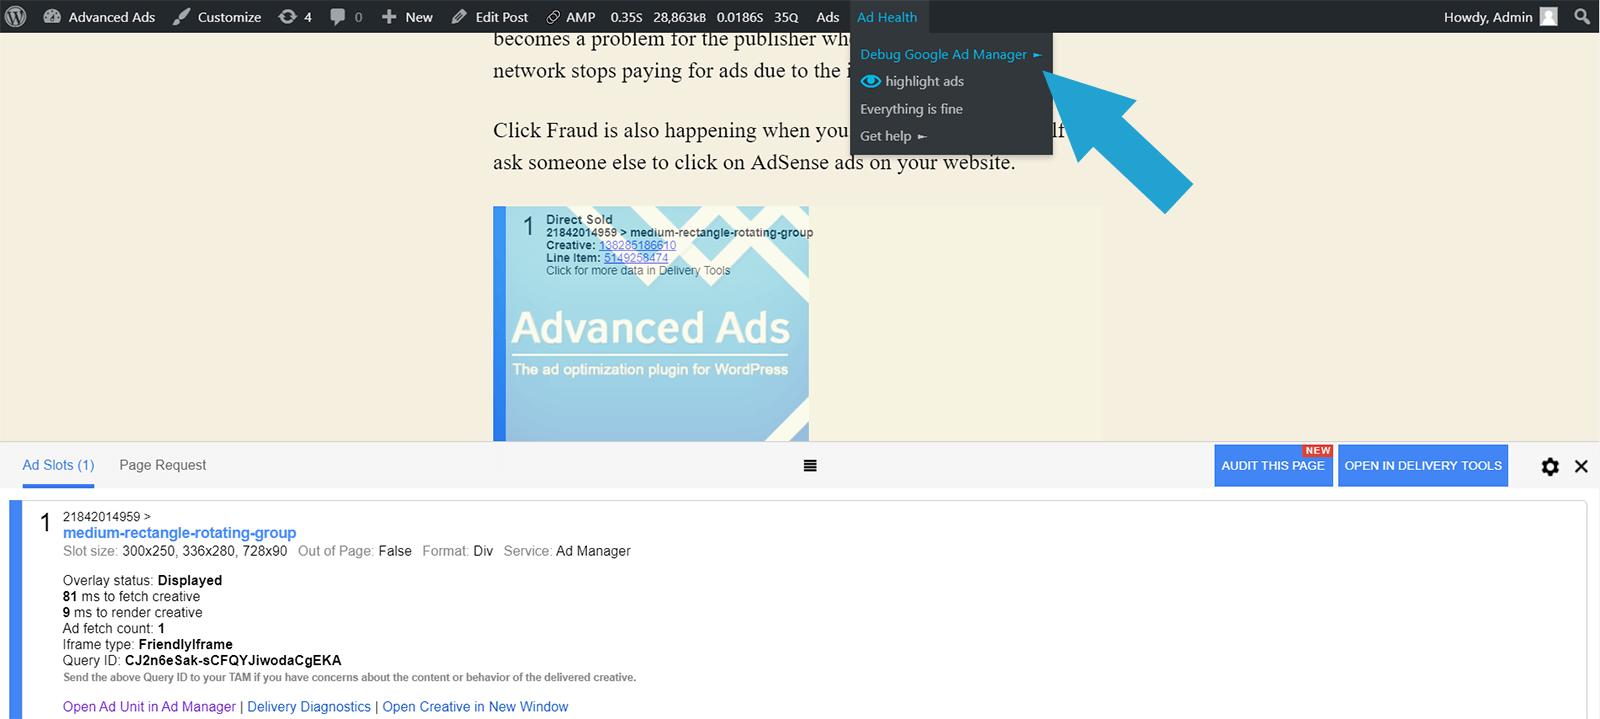 Debug Google Ad Manager